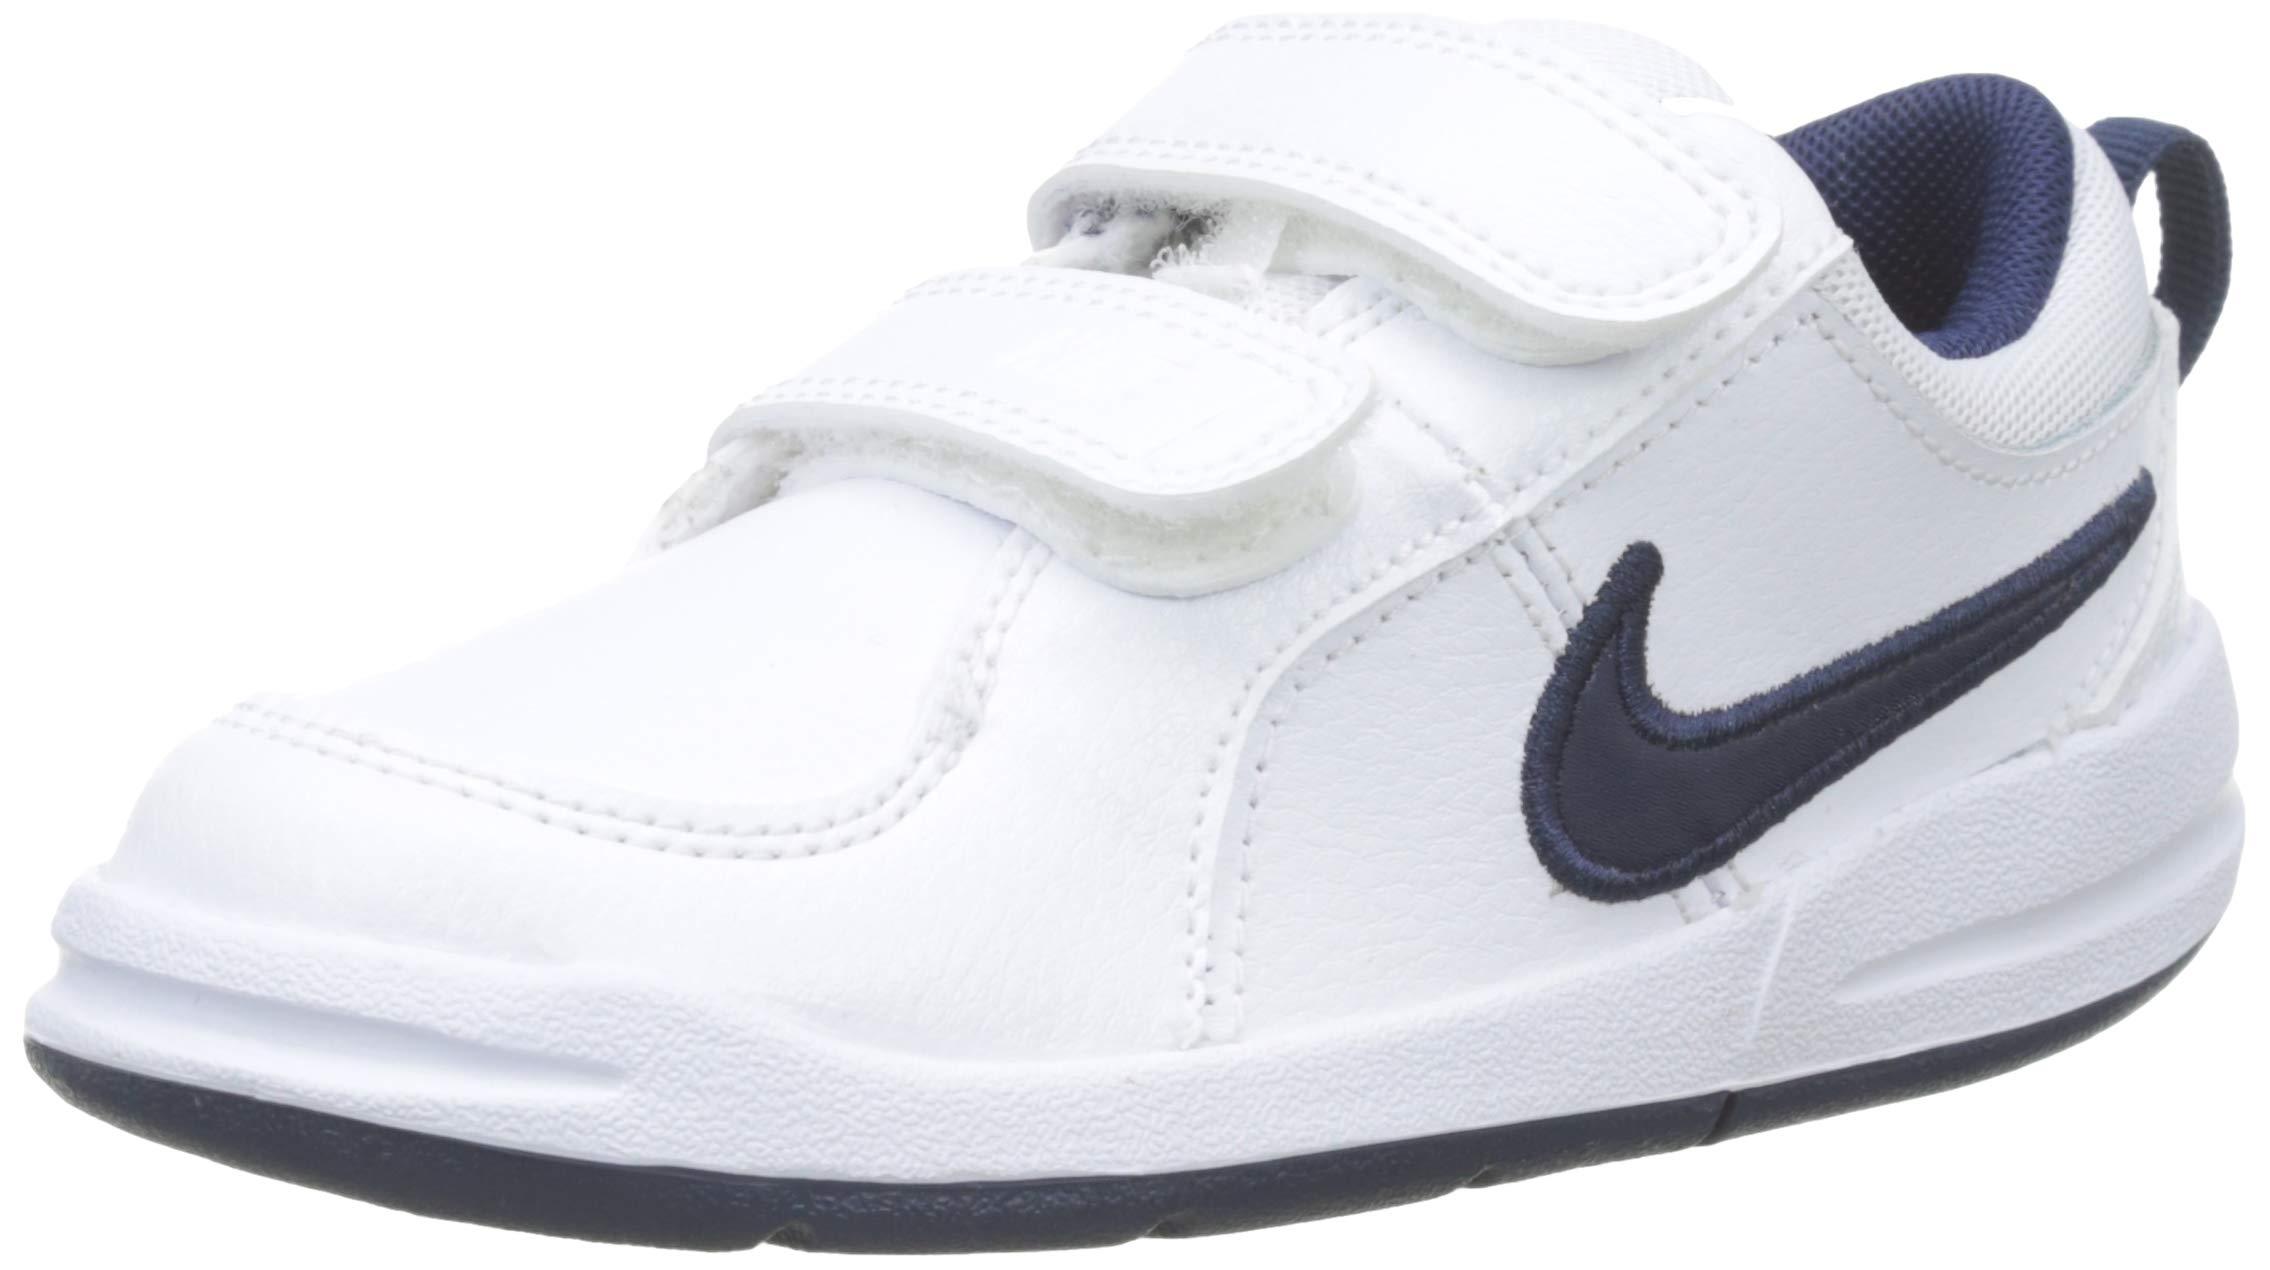 Nike Pico 4 (TDV), Calzado de Primeros Pasos para Niños product image